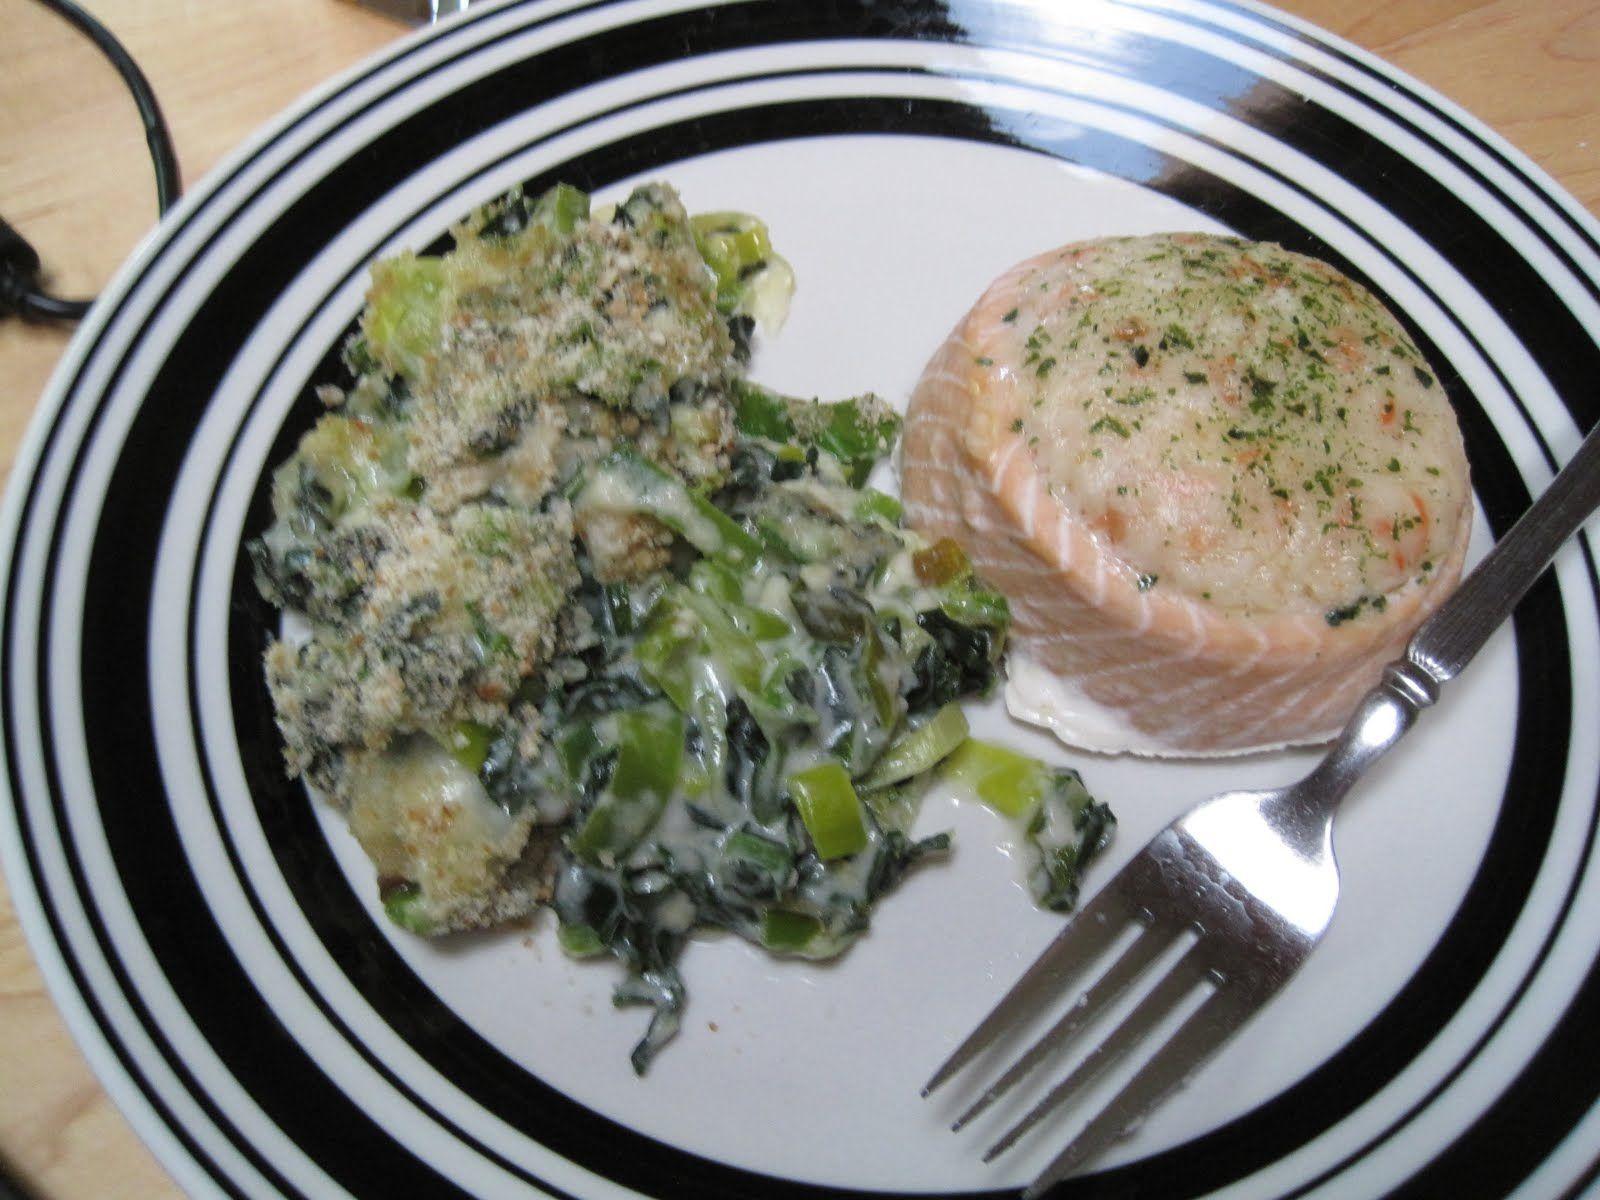 Mushroom & Red Rice Casserole with Baked Eggs & Kale ...  |Kale Turnip Casserole